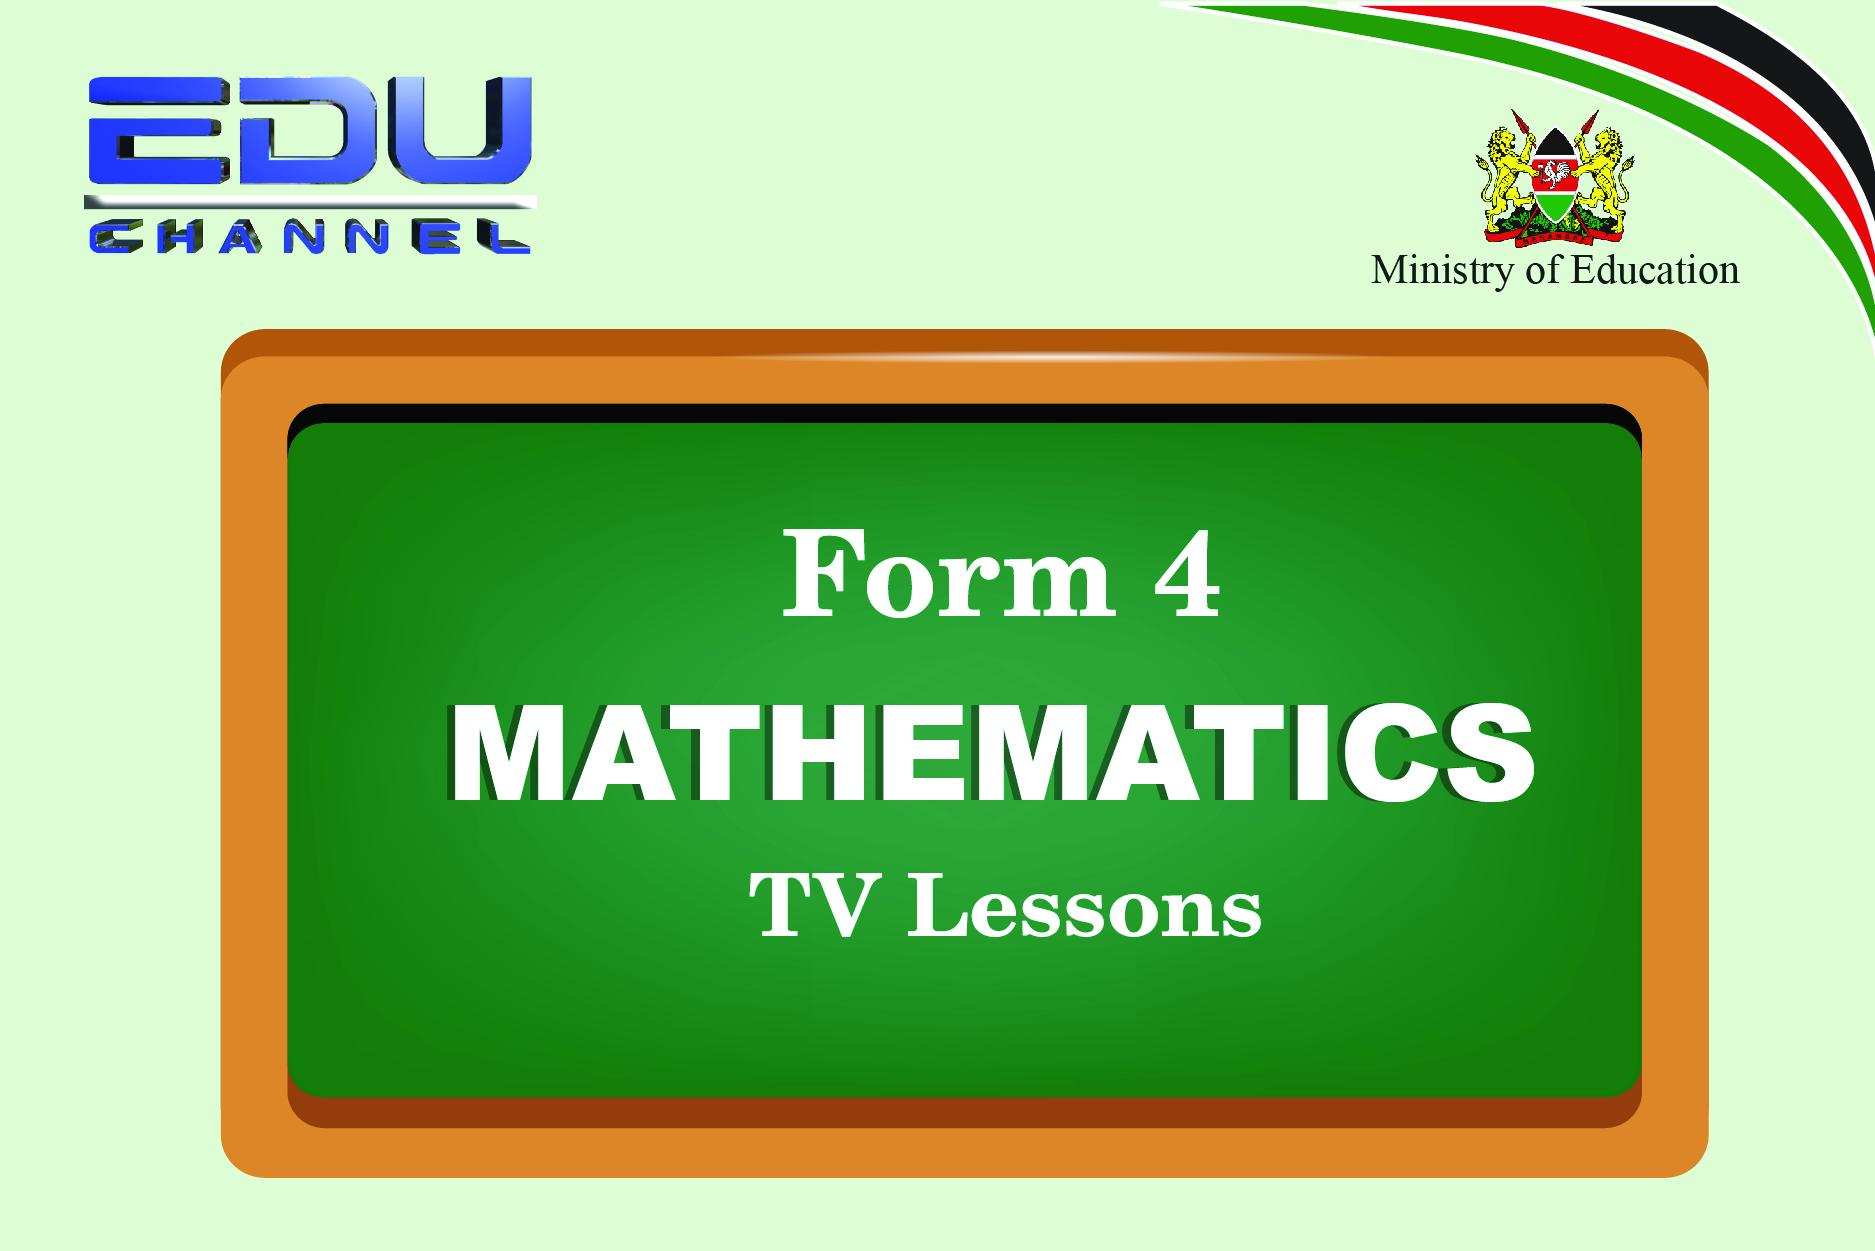 Form 4 Mathematics Lesson 5:Three dimensional geometry - Trigonometry